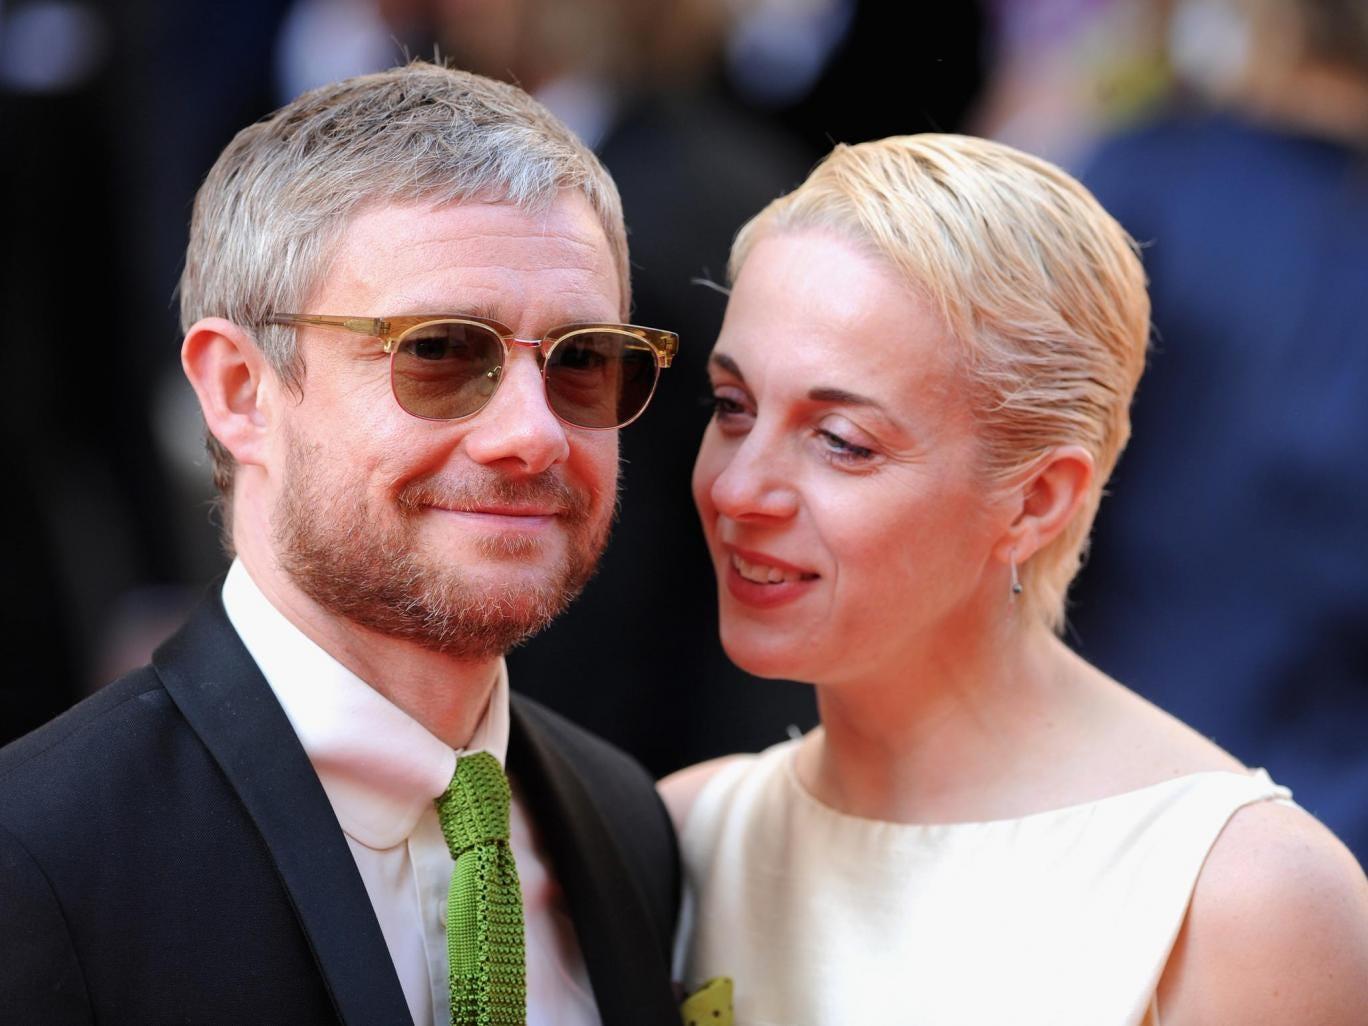 Martin Freeman and Amanda Abbington attend the Arqiva British Academy Television Awards at Theatre Royal